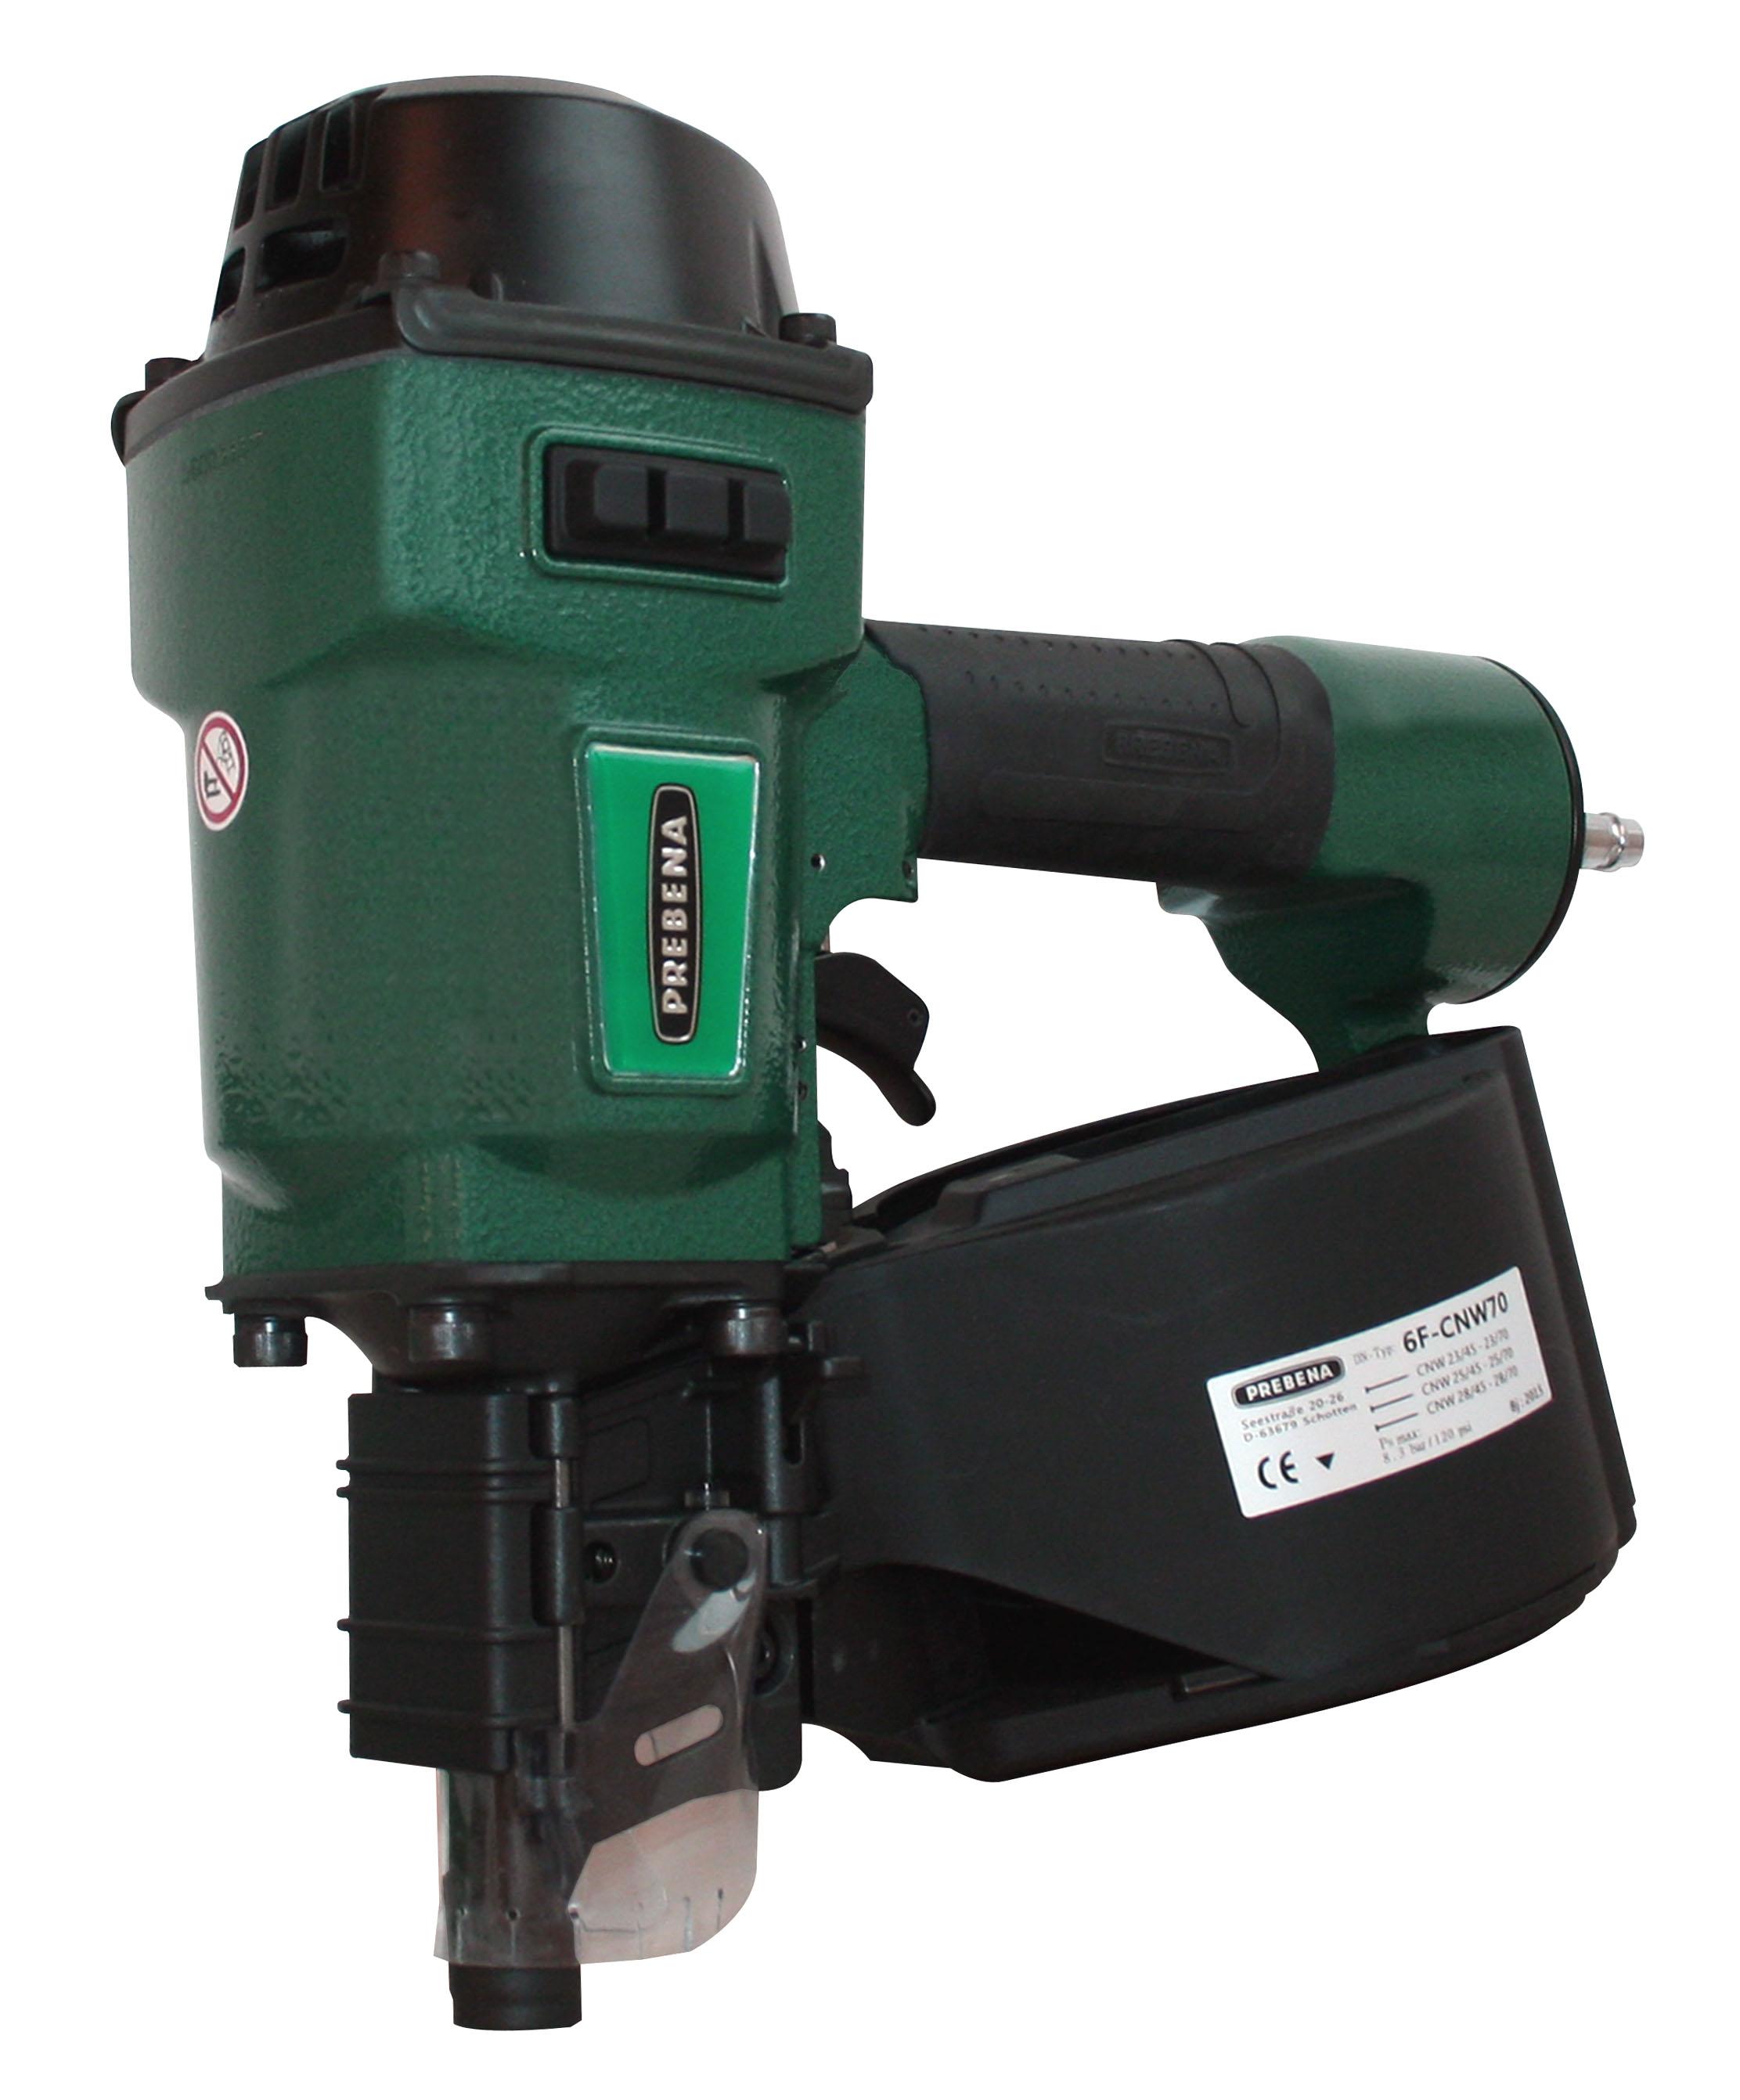 6F-CNW70 Druckluft-Coilnagler